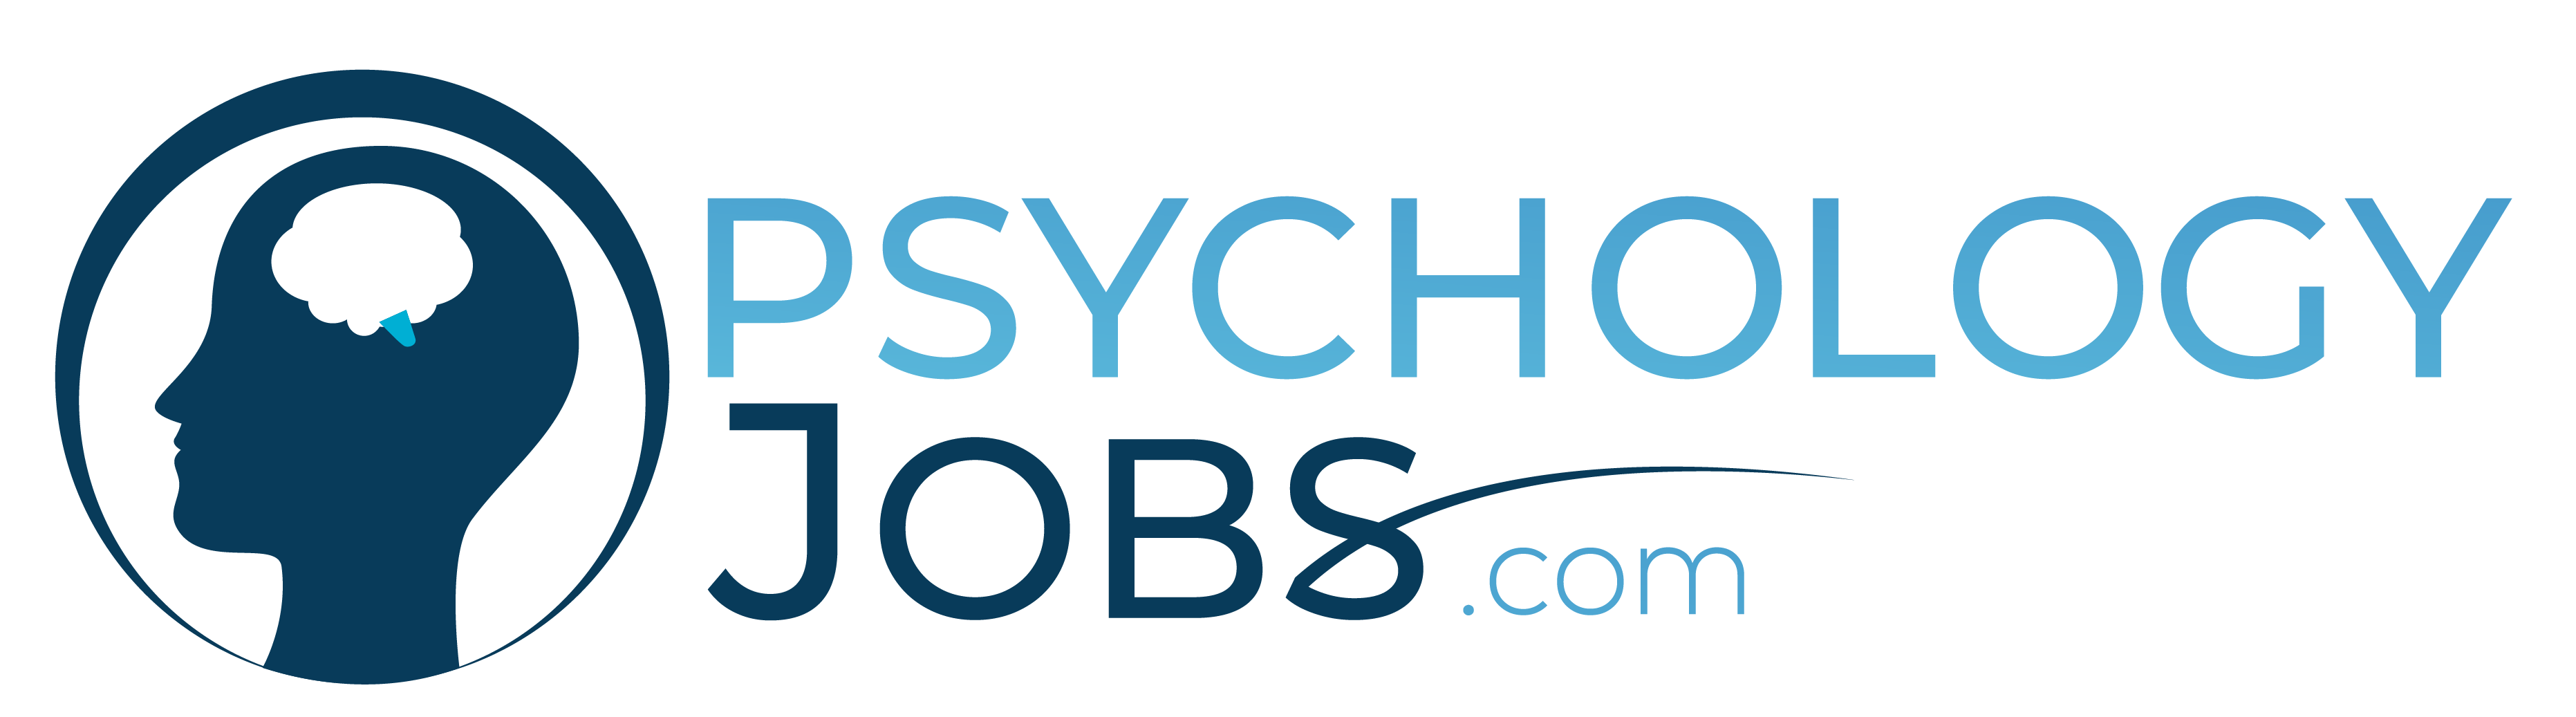 PsychologyJobs.com